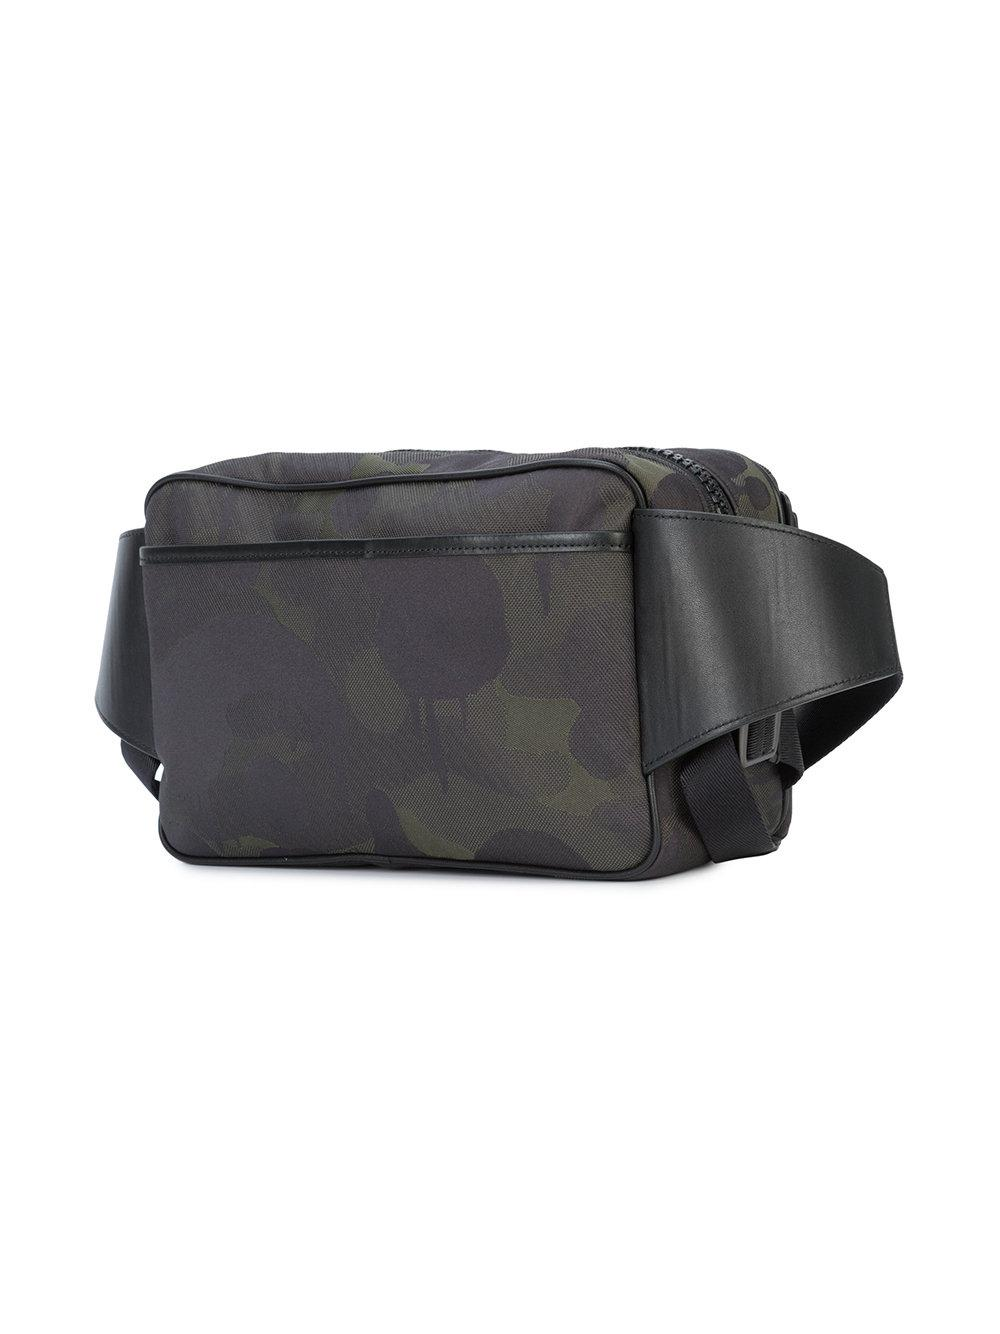 eb323552feba Lyst - COACH Utility Pack Belt Bag in Black for Men